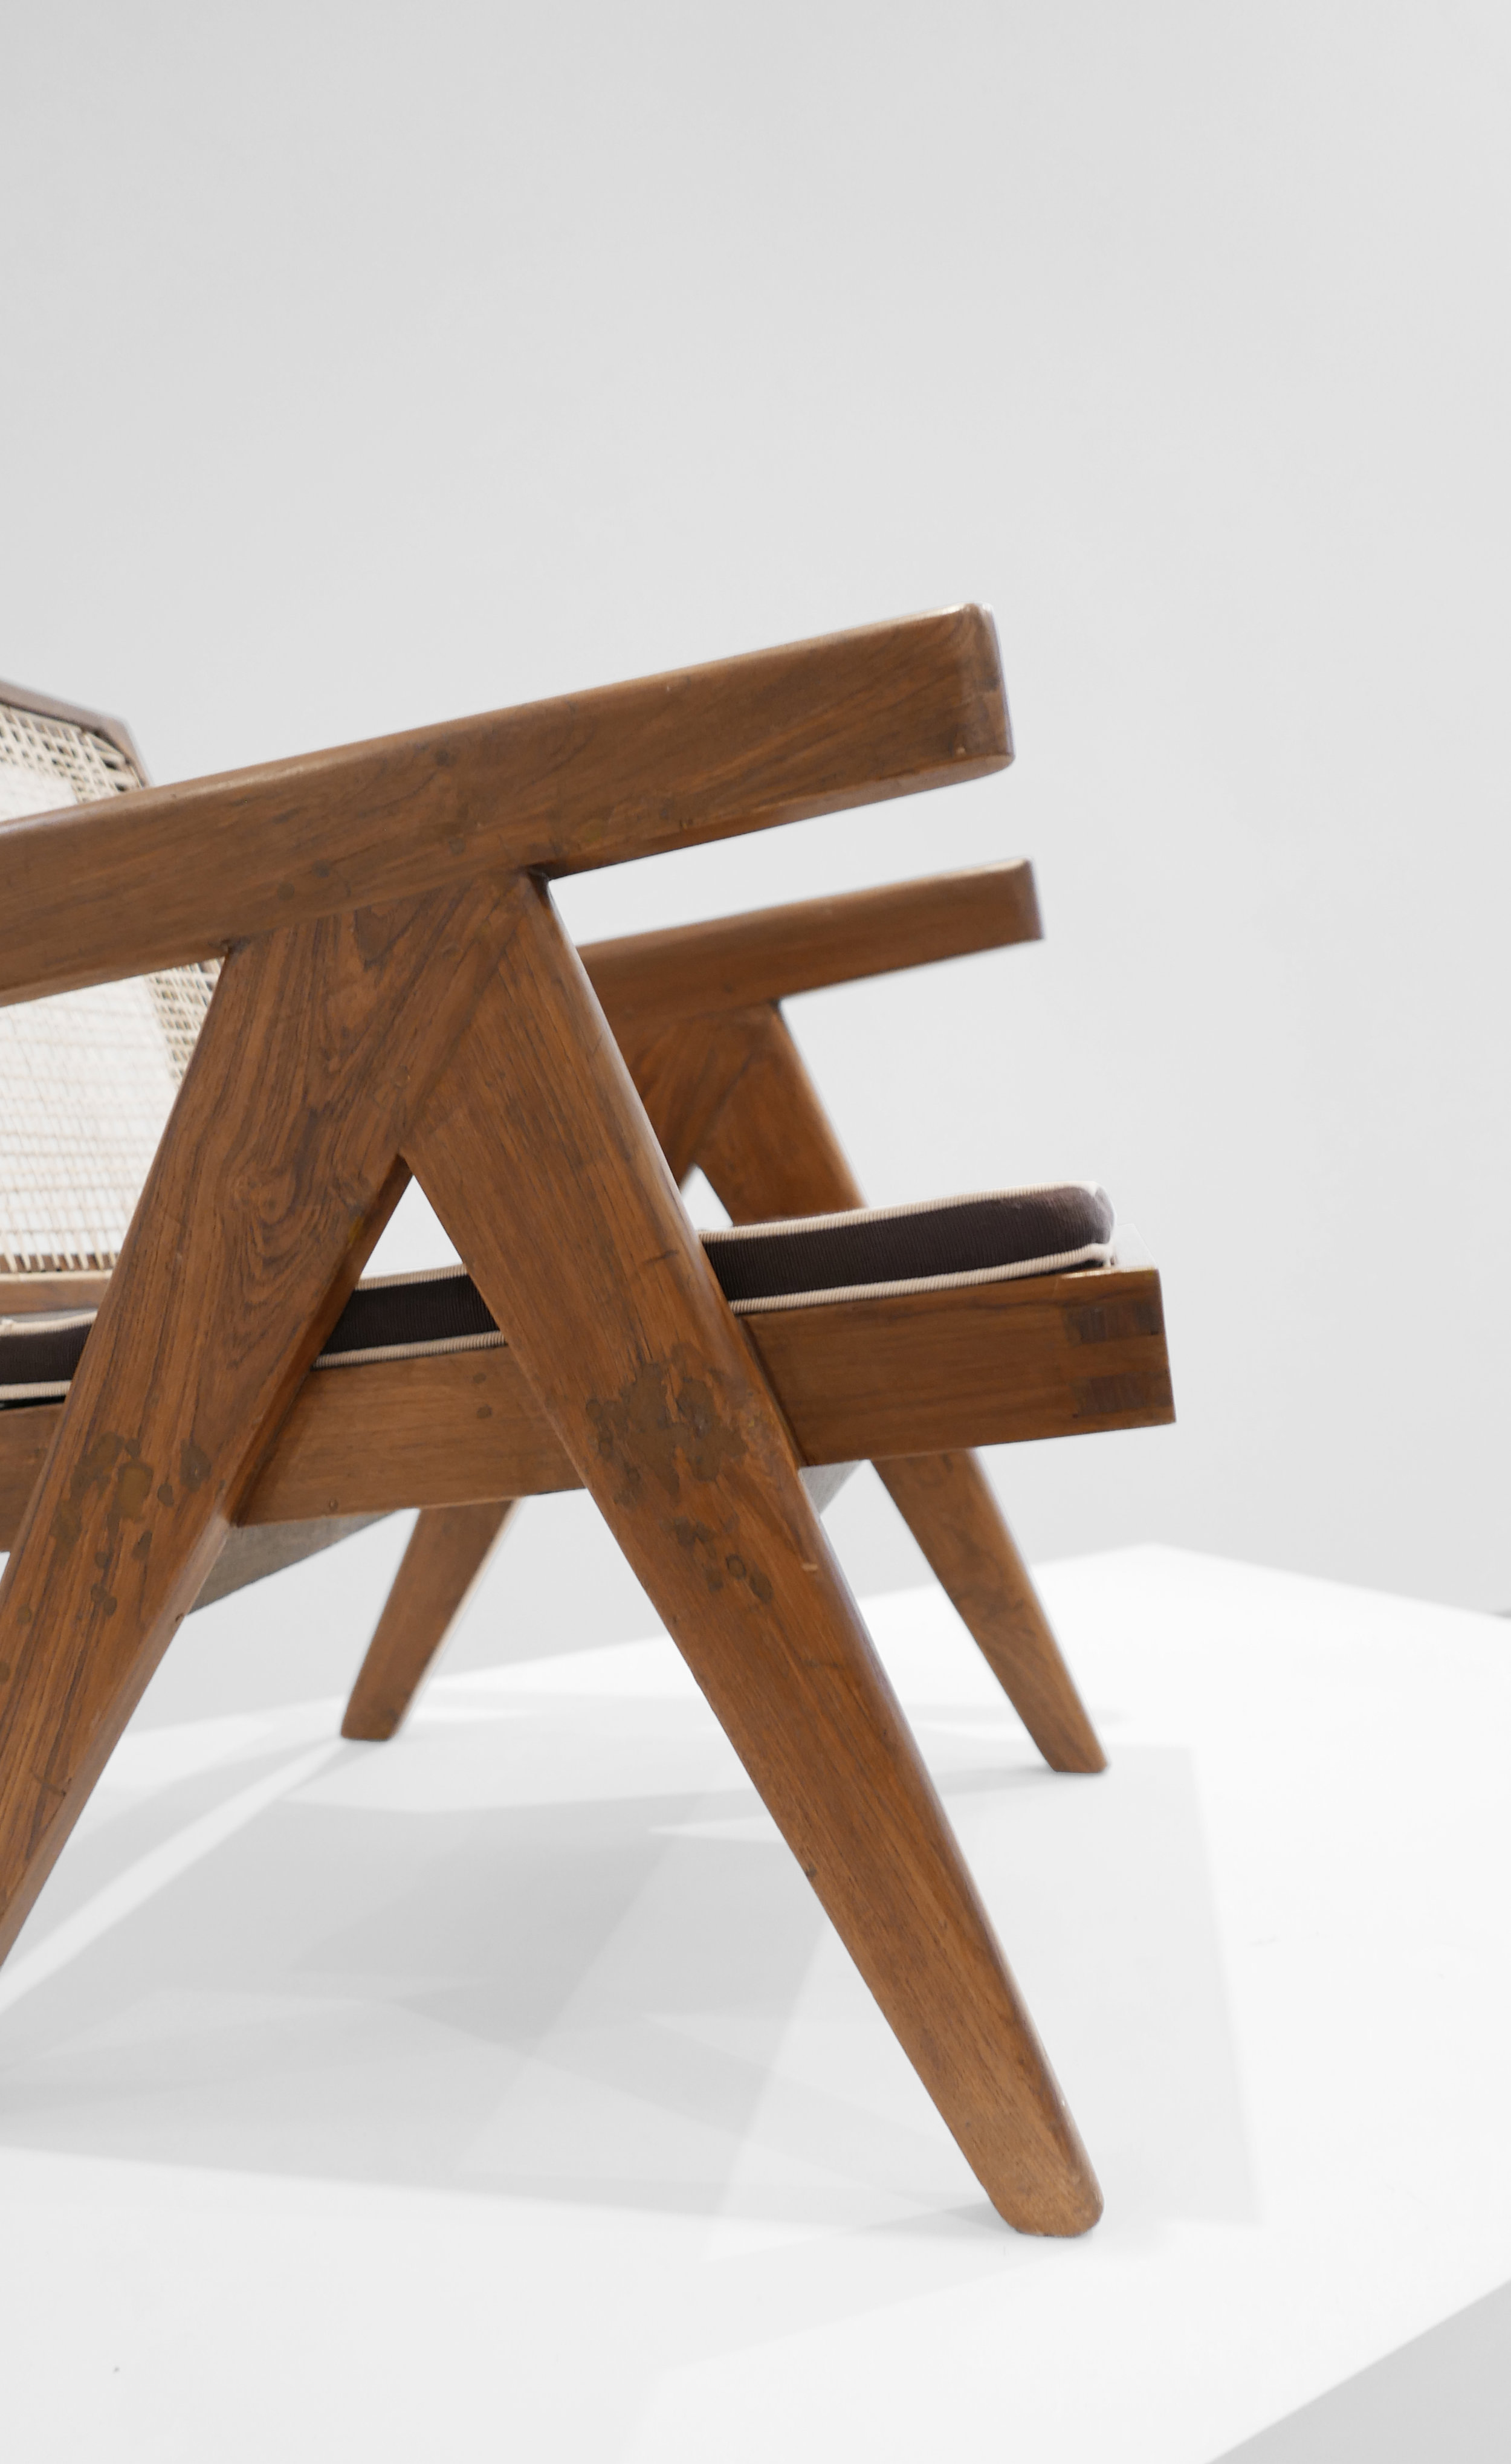 Pierre Jeanneret, Low lounge chair, model PJ-SI-29-A, c. 1955, teak, cane, 24.5H x 20.5W x 29.5D inches_5.jpg